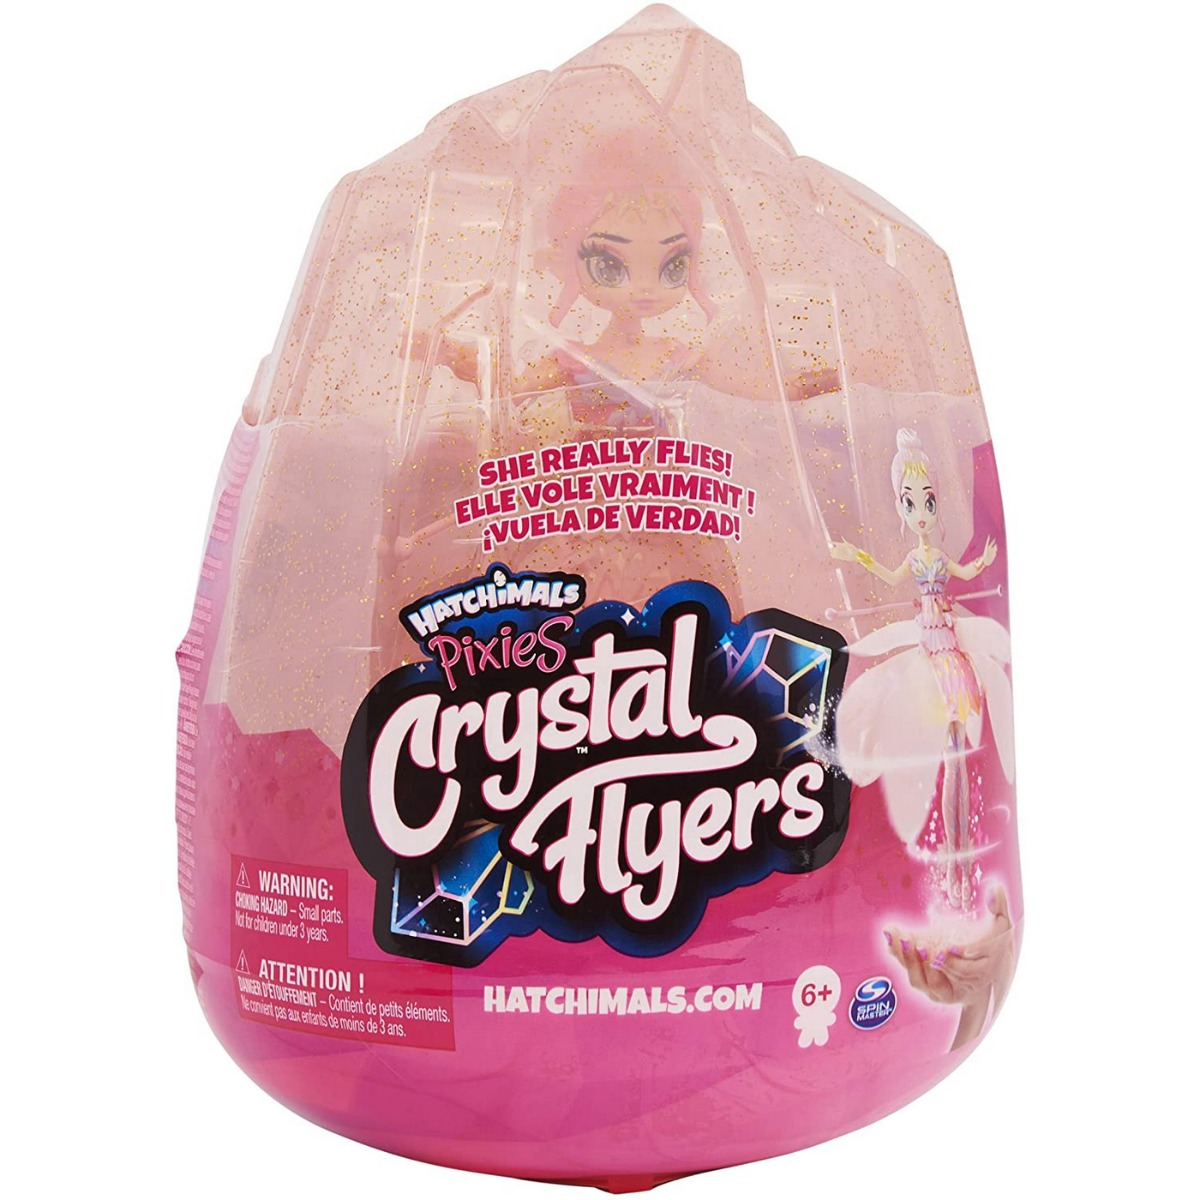 Figurina Hatchimals Pixies Crystal Flyers, Zana zburatoare, Roz